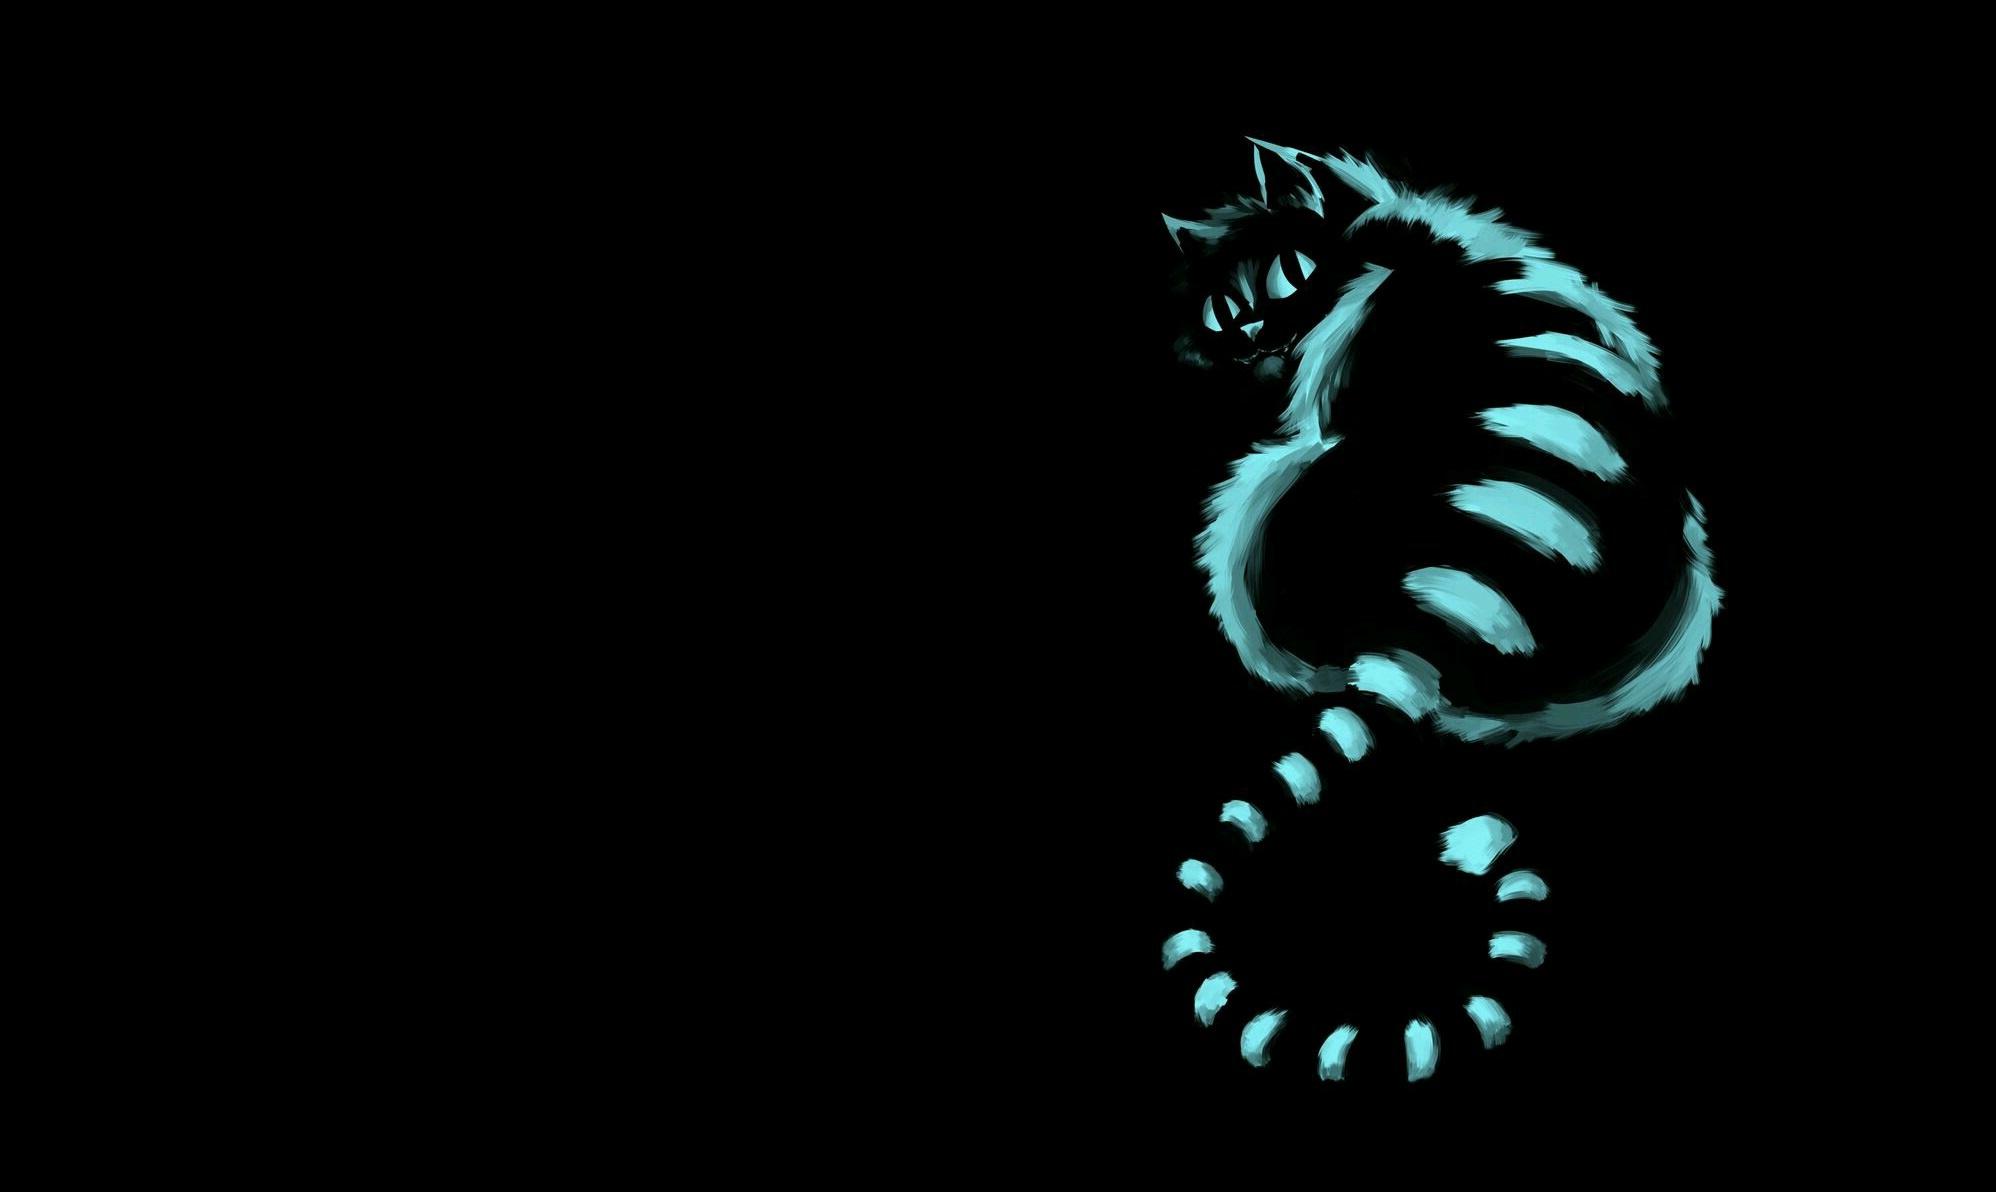 Dessin De Cheshire Cat